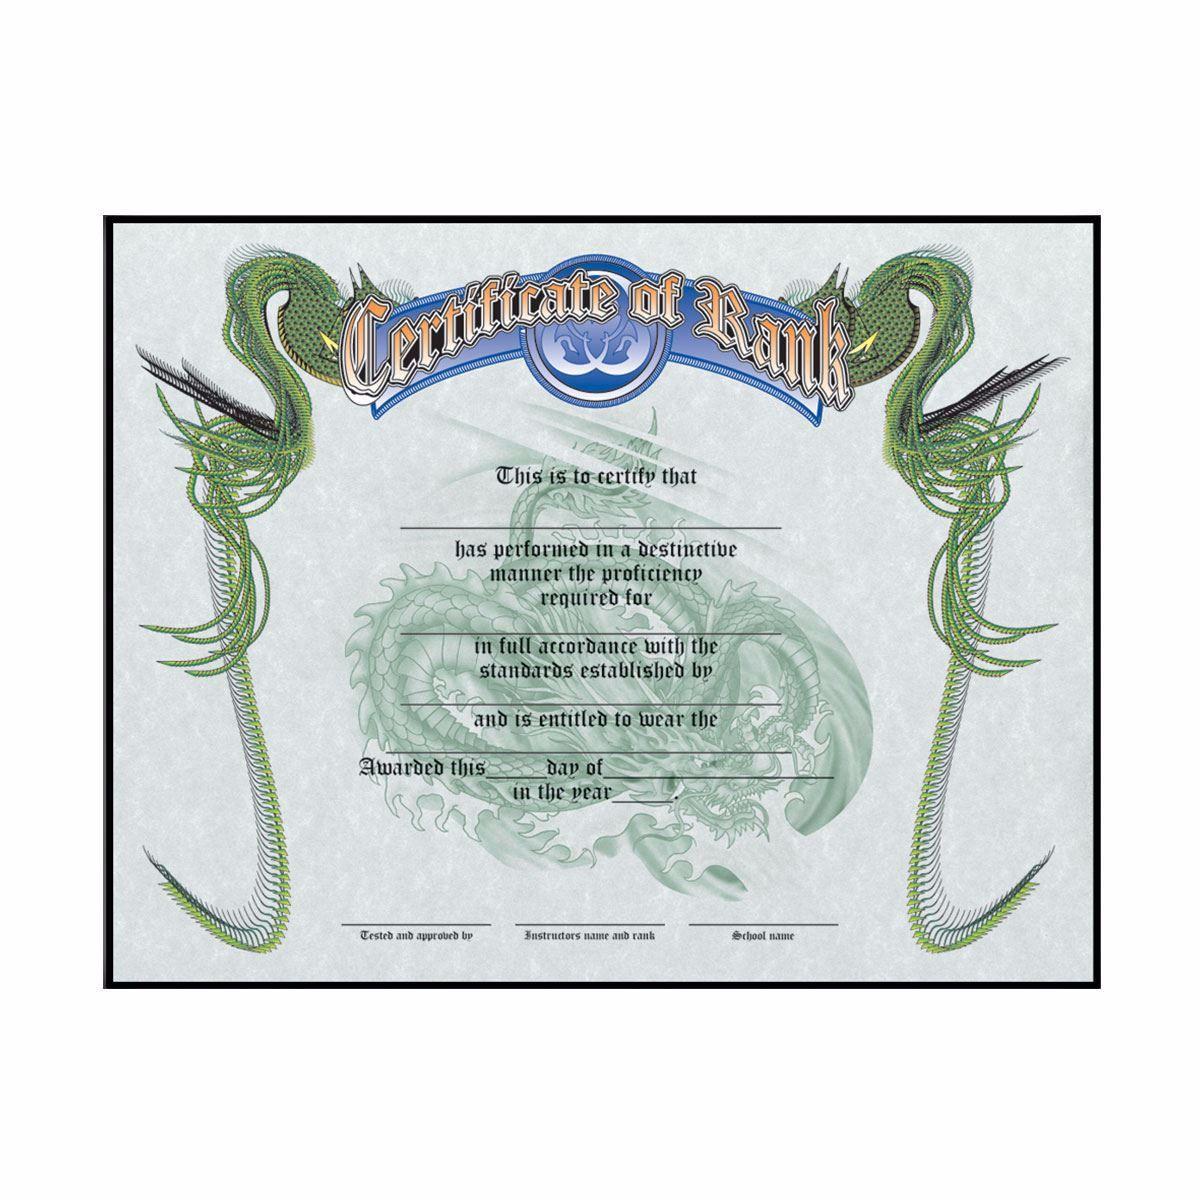 Pack of 5 TaeKwonDo /& Karate Rank Certificates Martial Arts Certificates